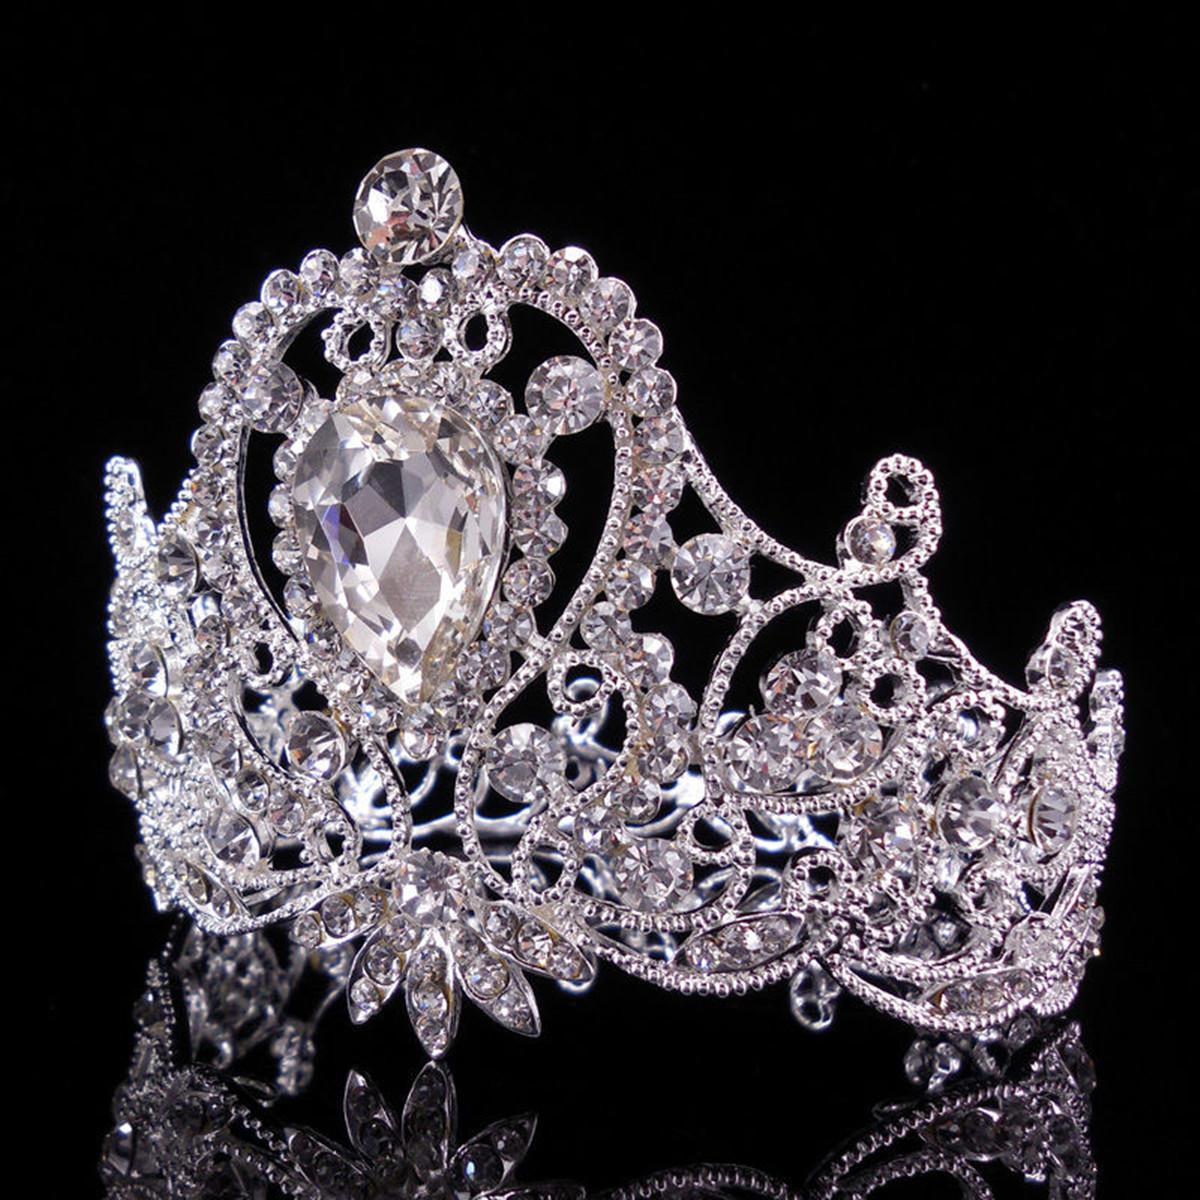 Princess Bridal Rhinestone Crystal Hair Tiara Wedding